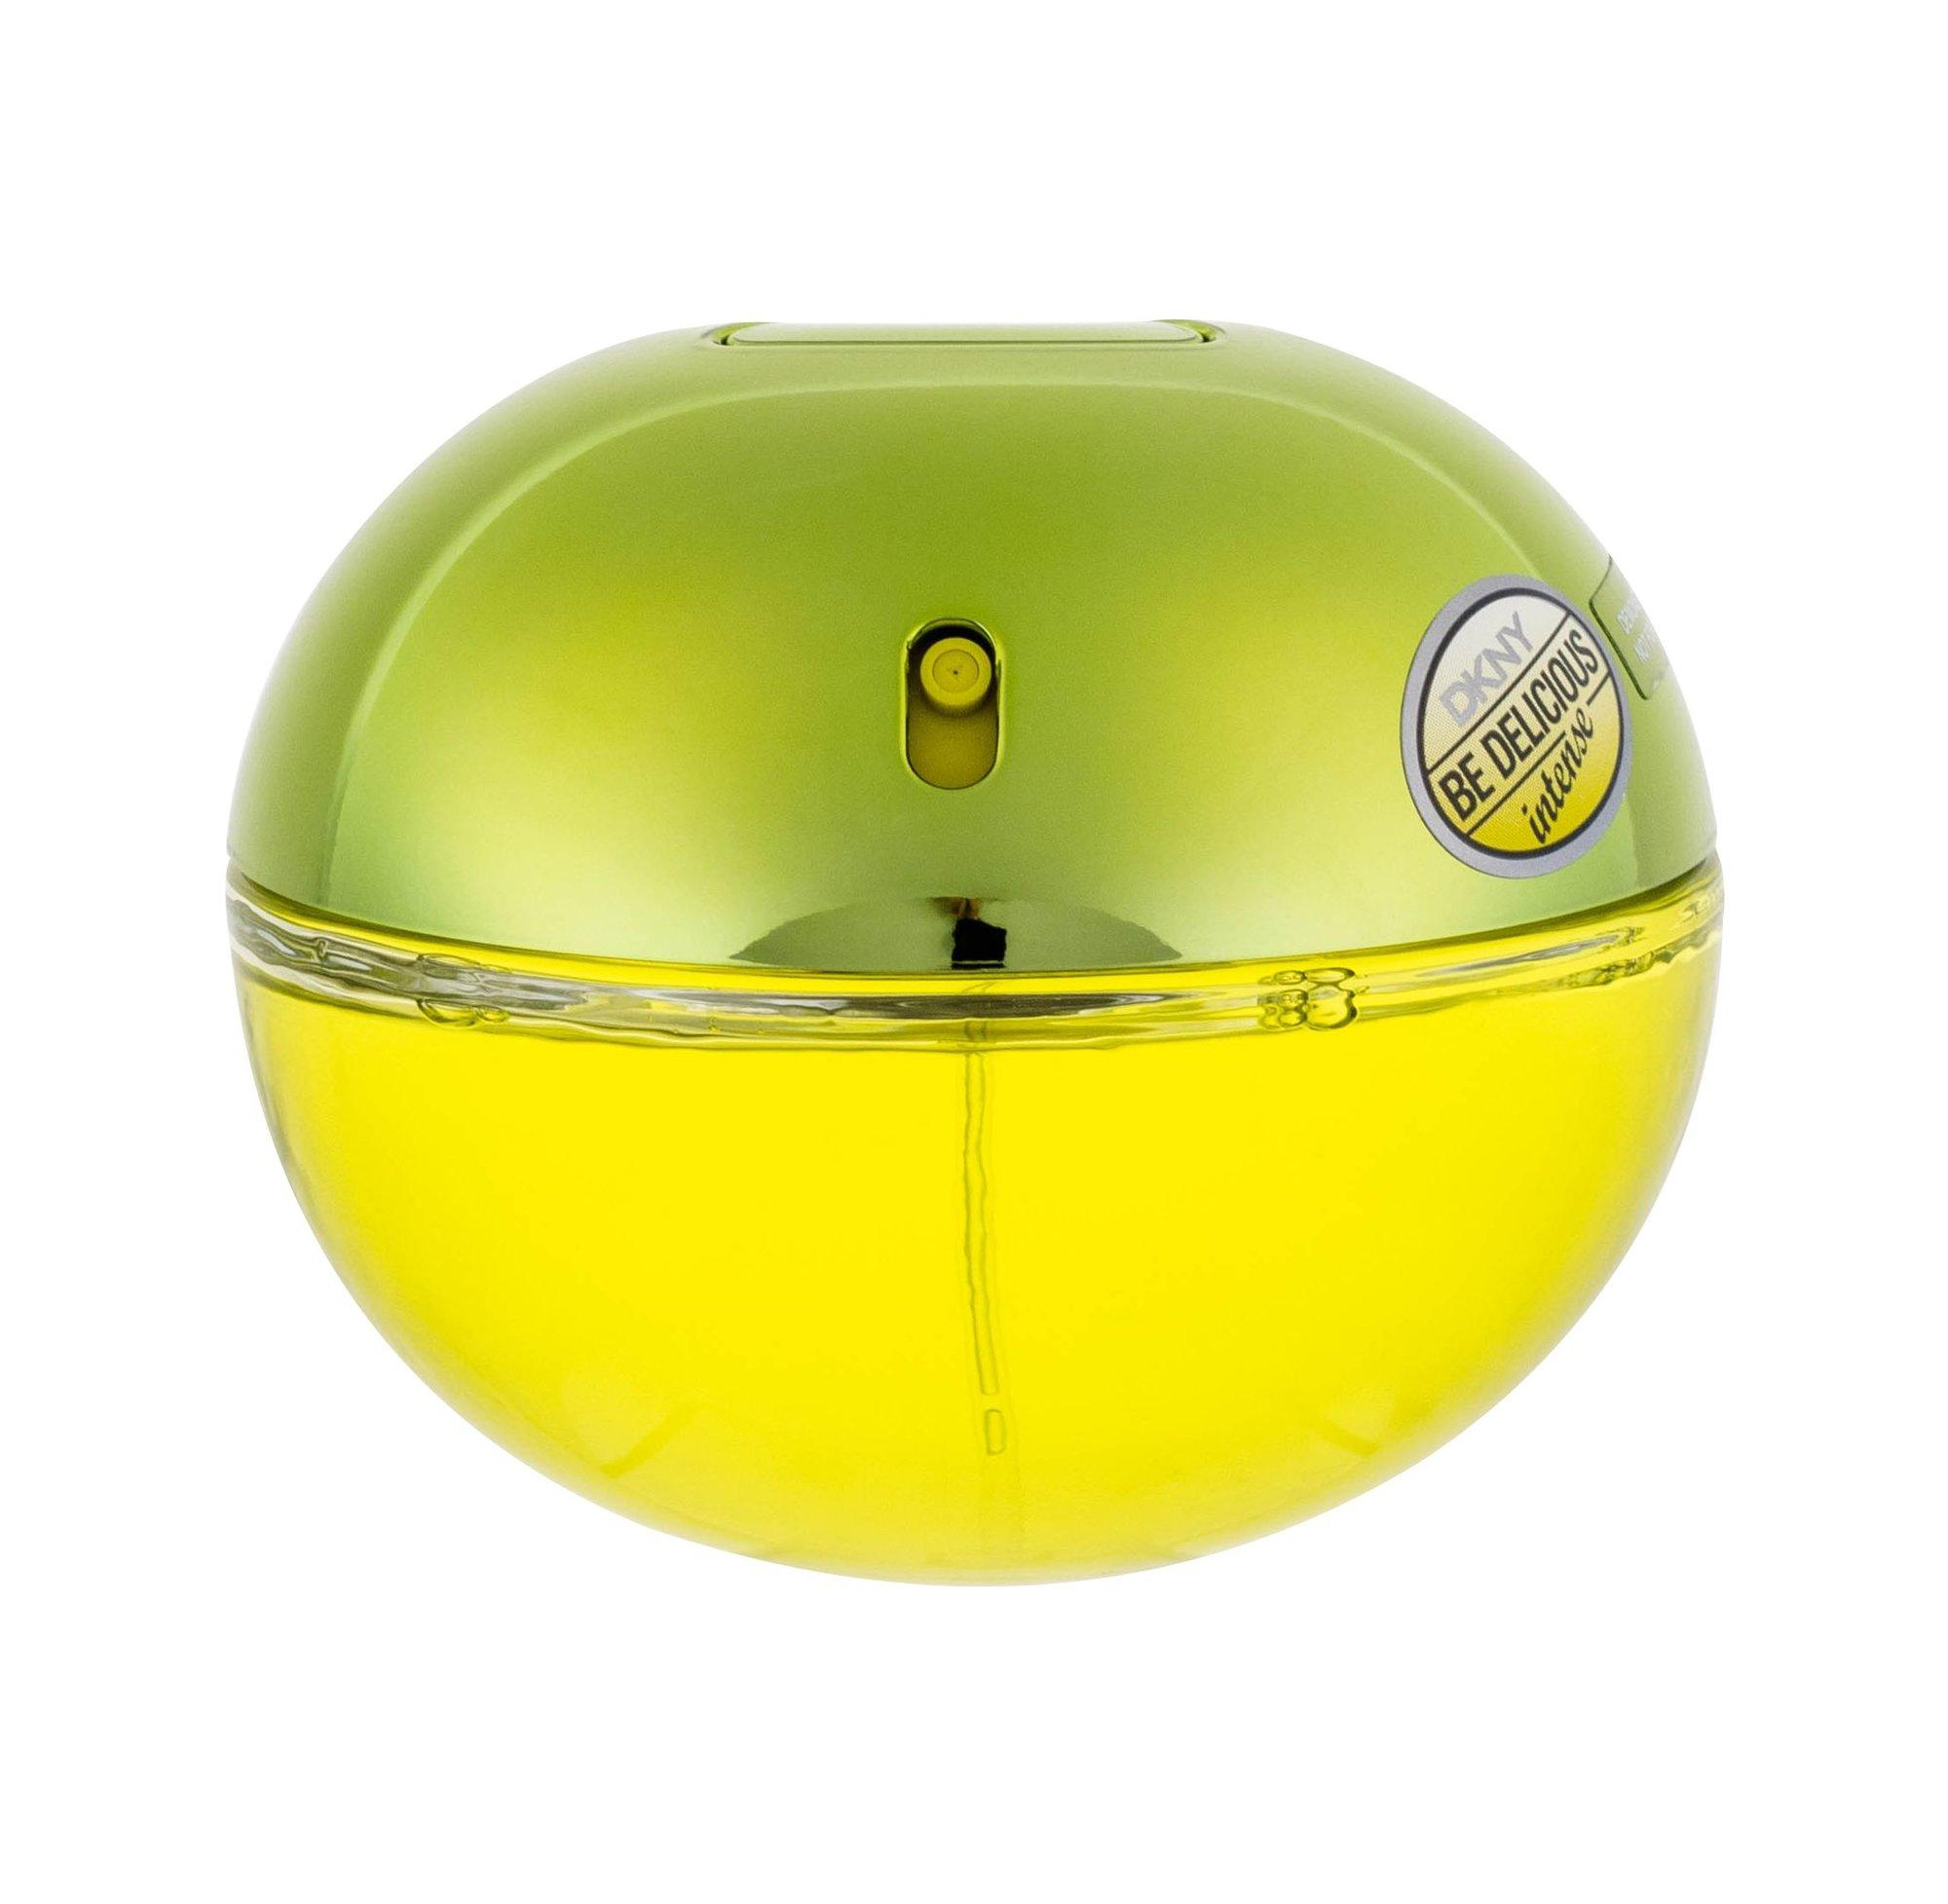 DKNY DKNY Be Delicious Eau So Intense, Parfumovaná voda 100ml, Tester